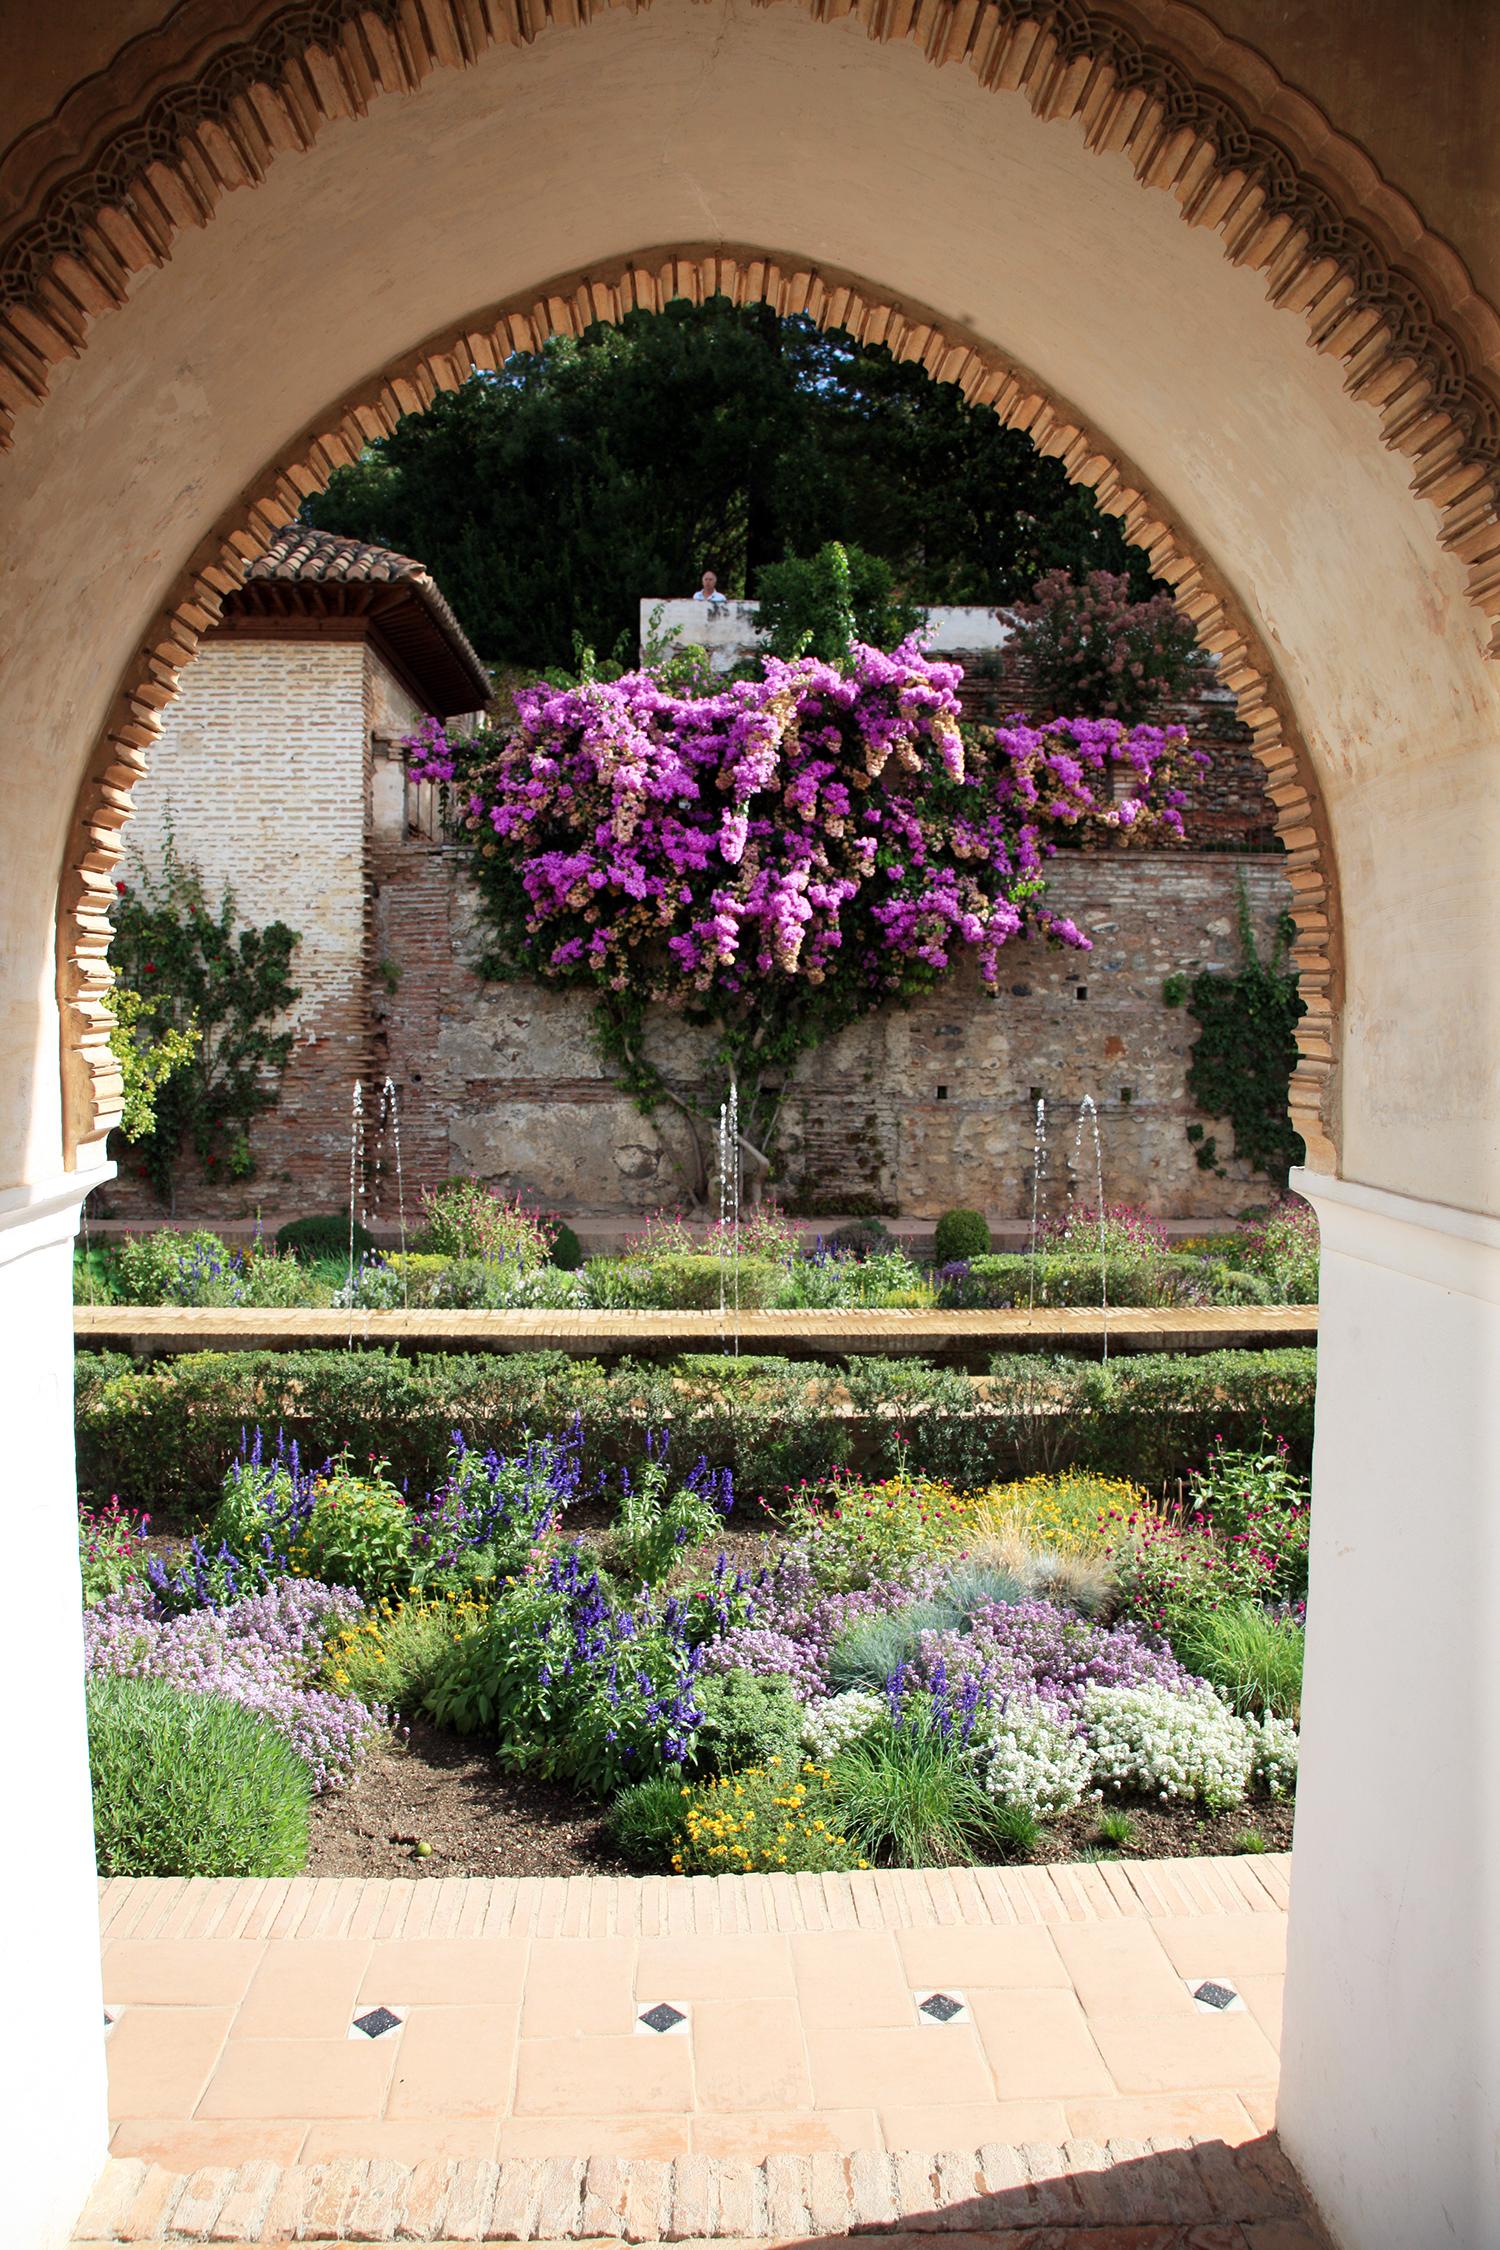 The Garden at Alhambra